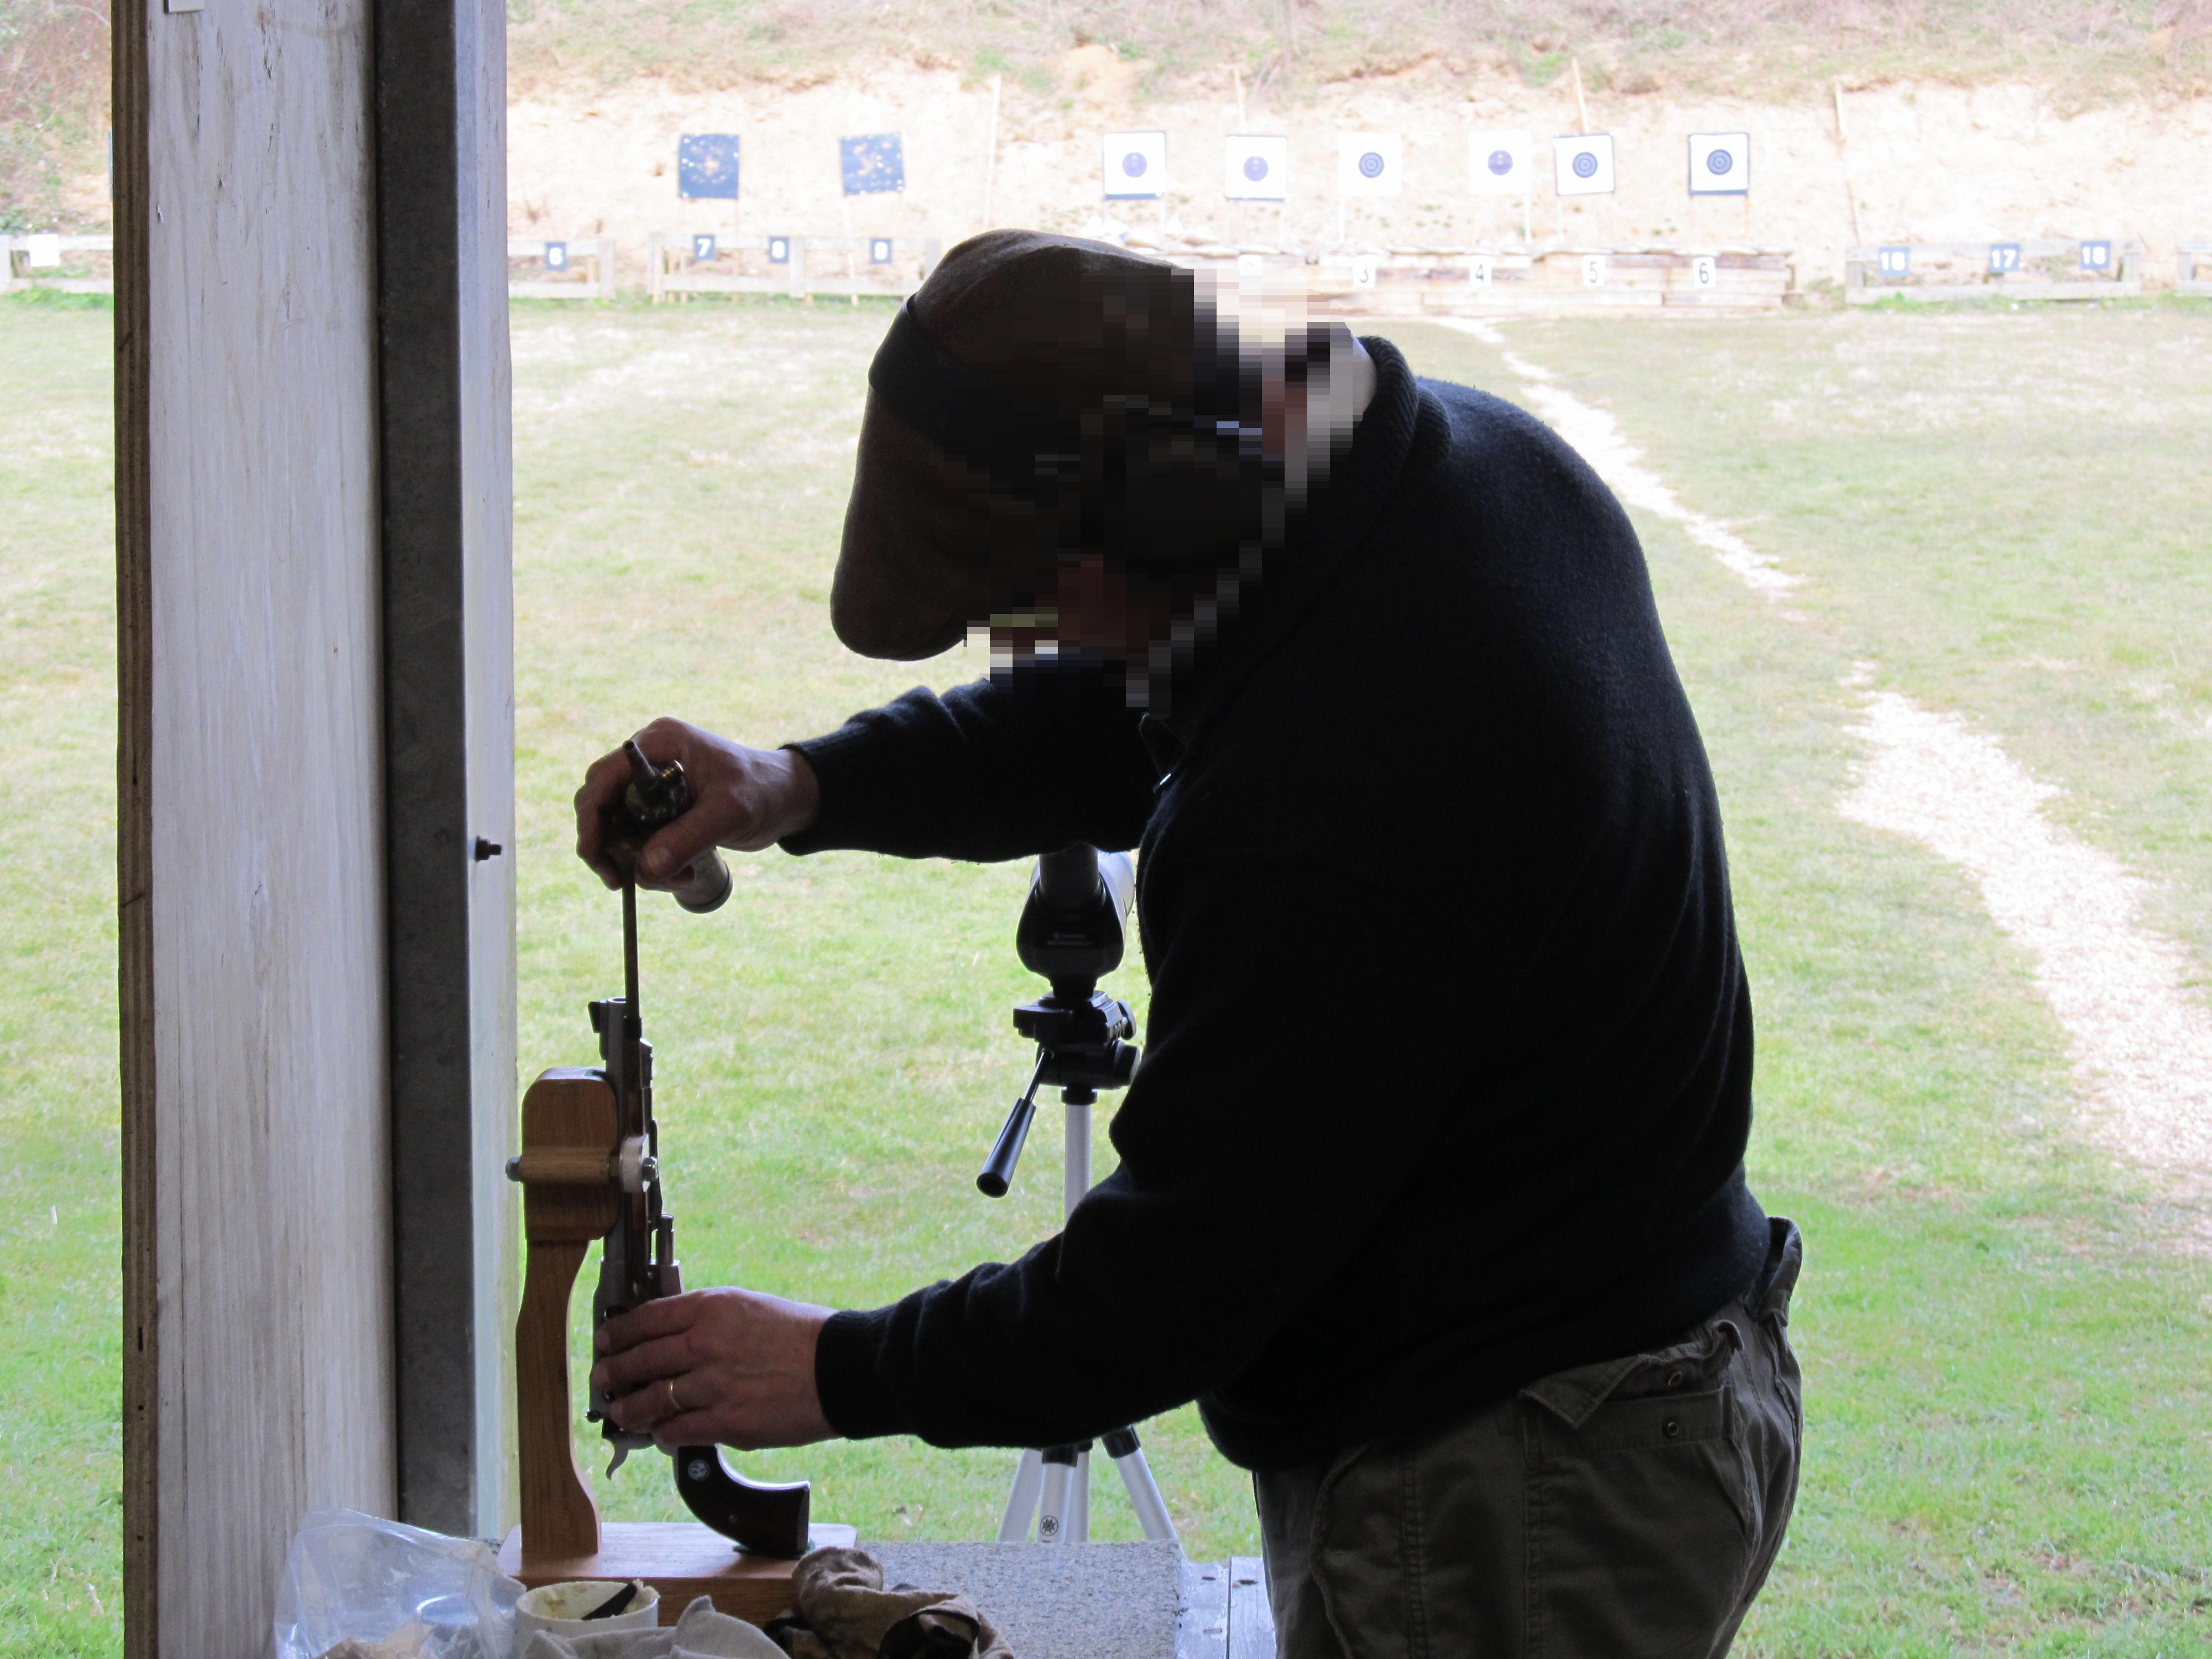 Black powder revolver loading